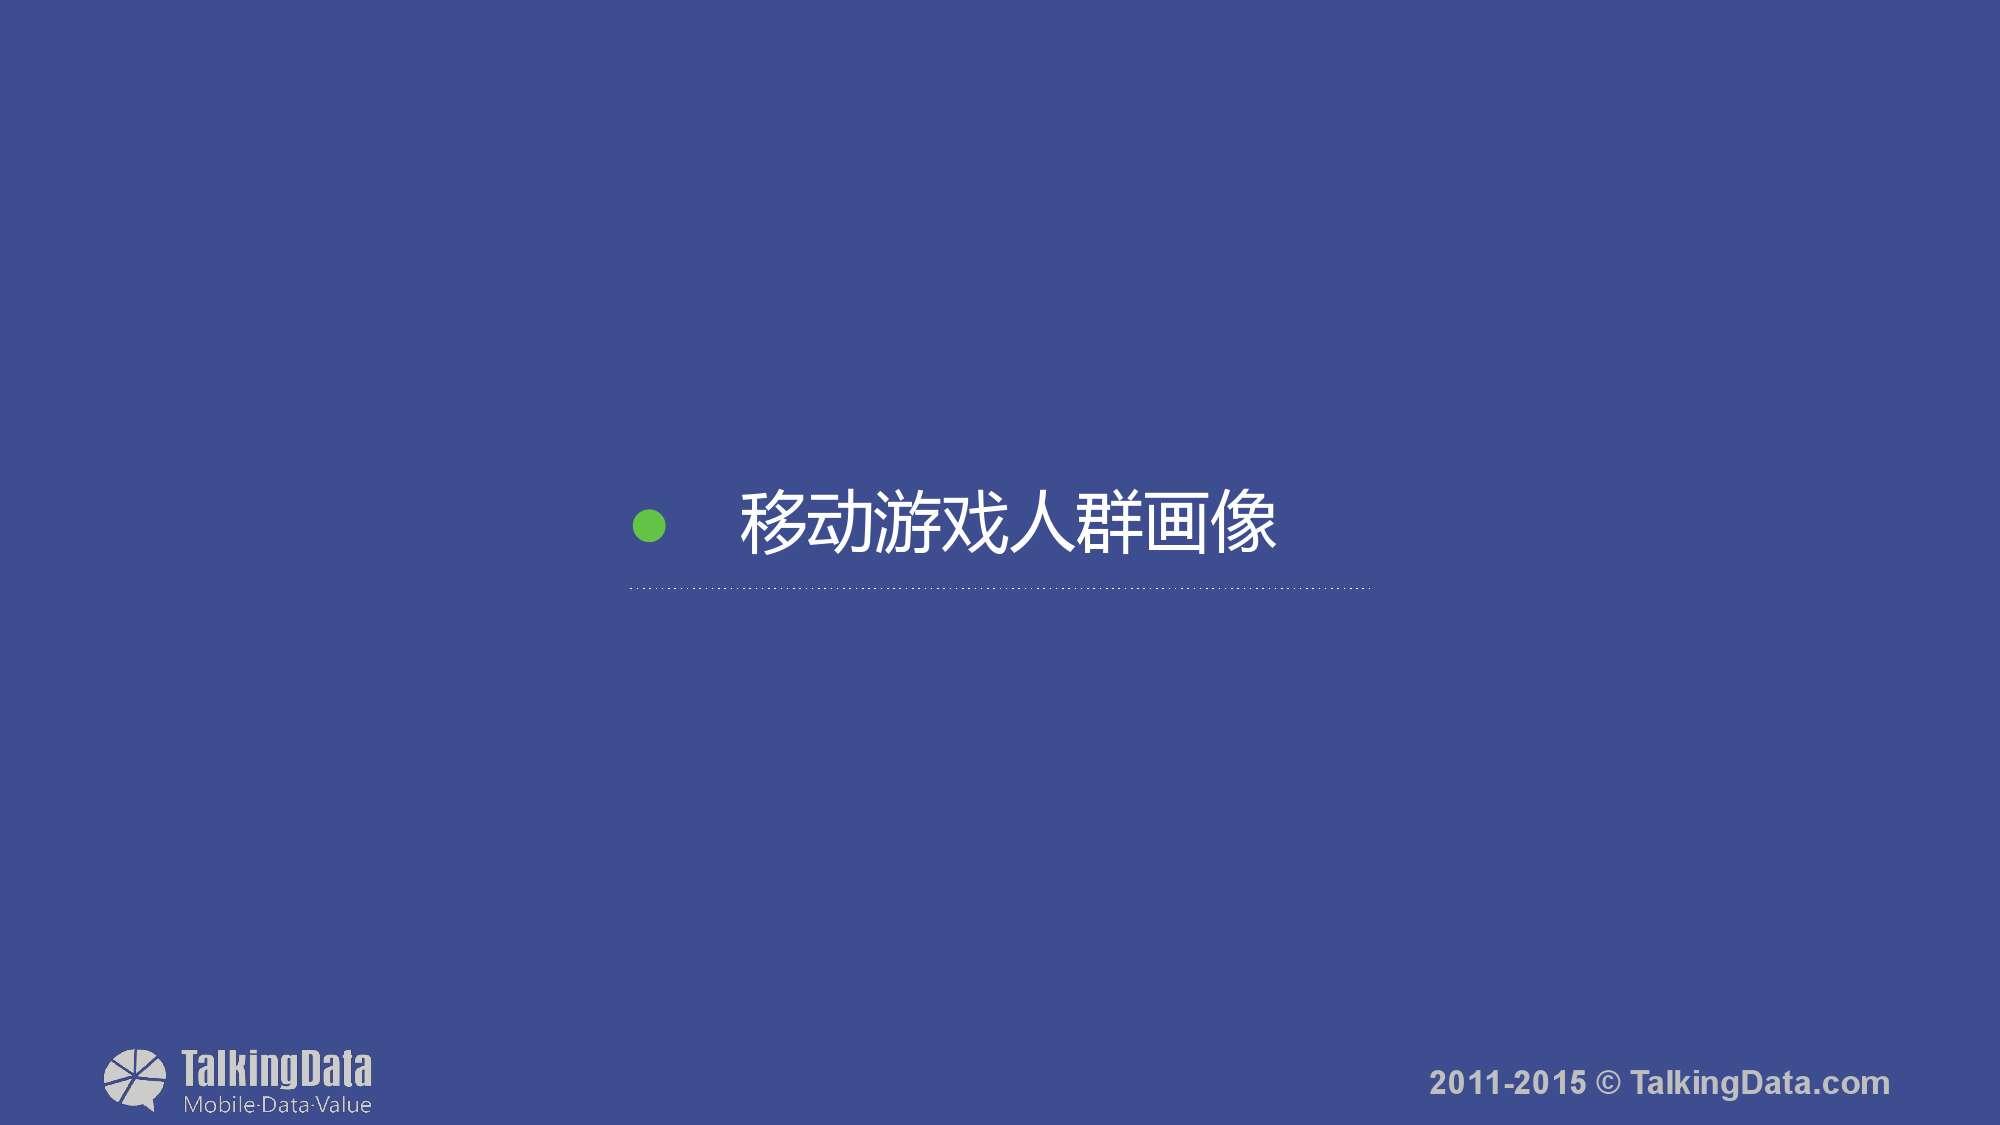 TalkingData-2015年移动游戏行业报告_000013